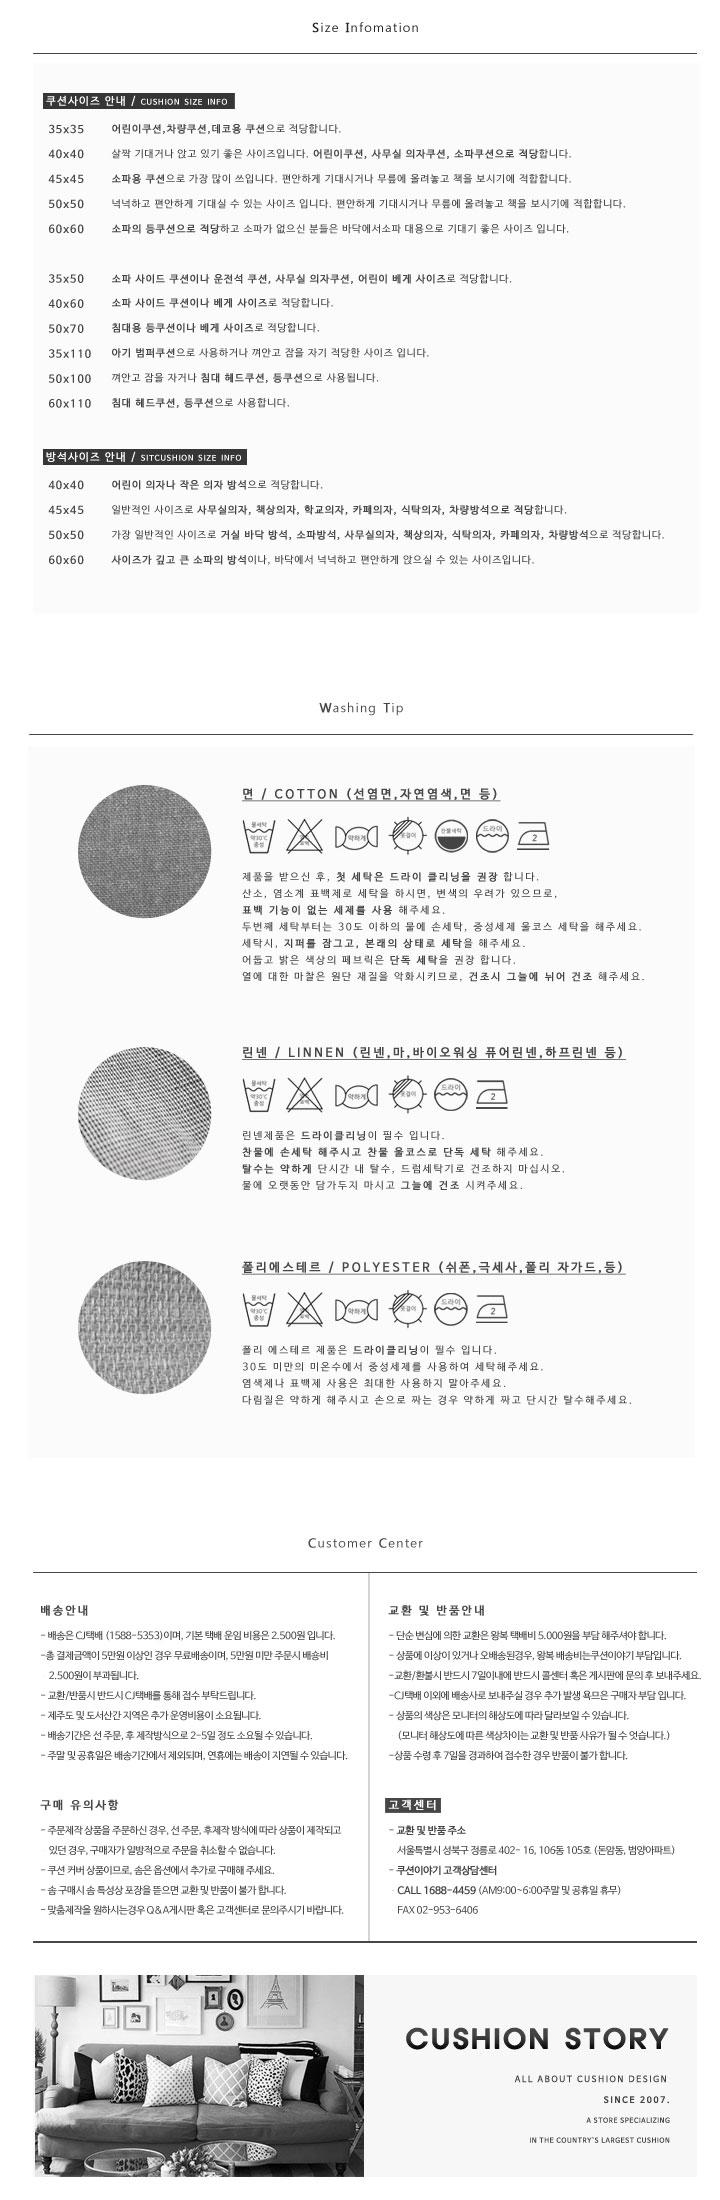 Mandy 맨디 (no5-no8) 방석 쿠션 - 쿠션이야기, 18,100원, 쿠션, 무지/솔리드